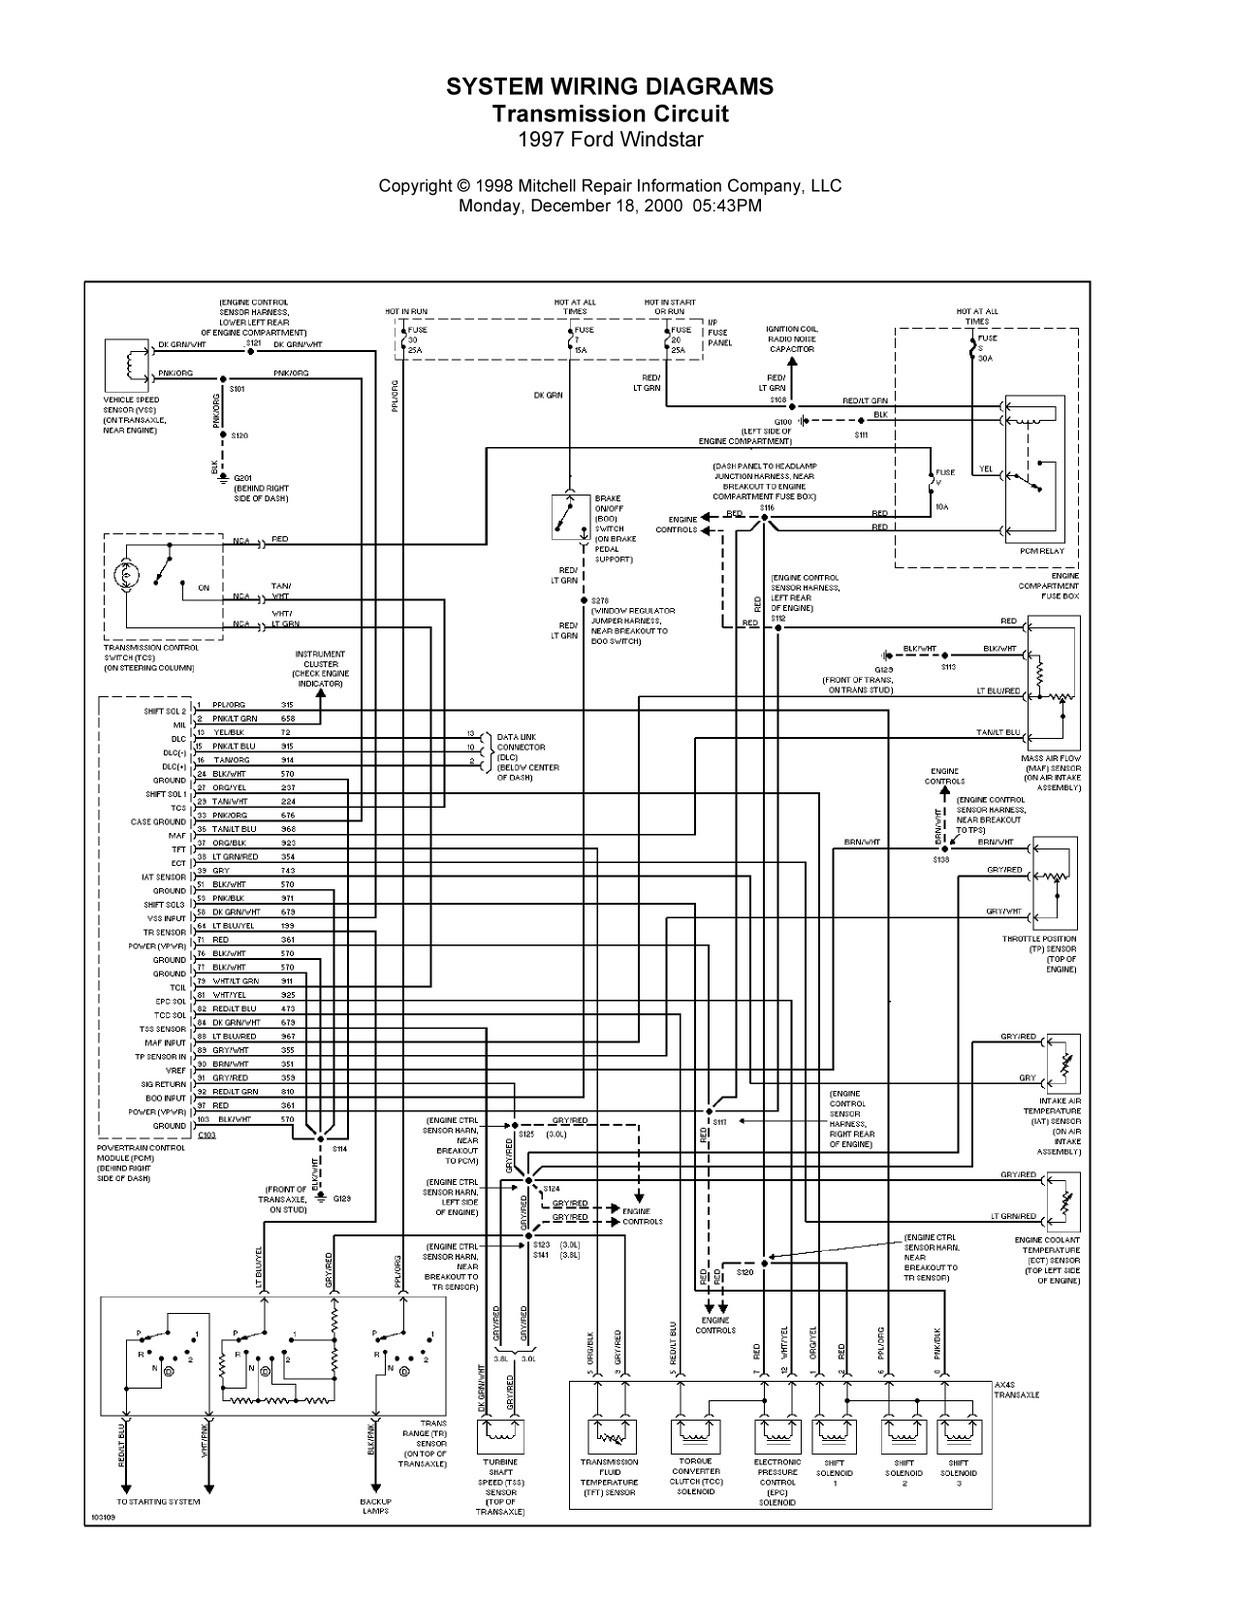 Interconnected Smoke Alarm Wiring Diagram Security System Wiring Diagrams Diagram Base Website Wiring Of Interconnected Smoke Alarm Wiring Diagram